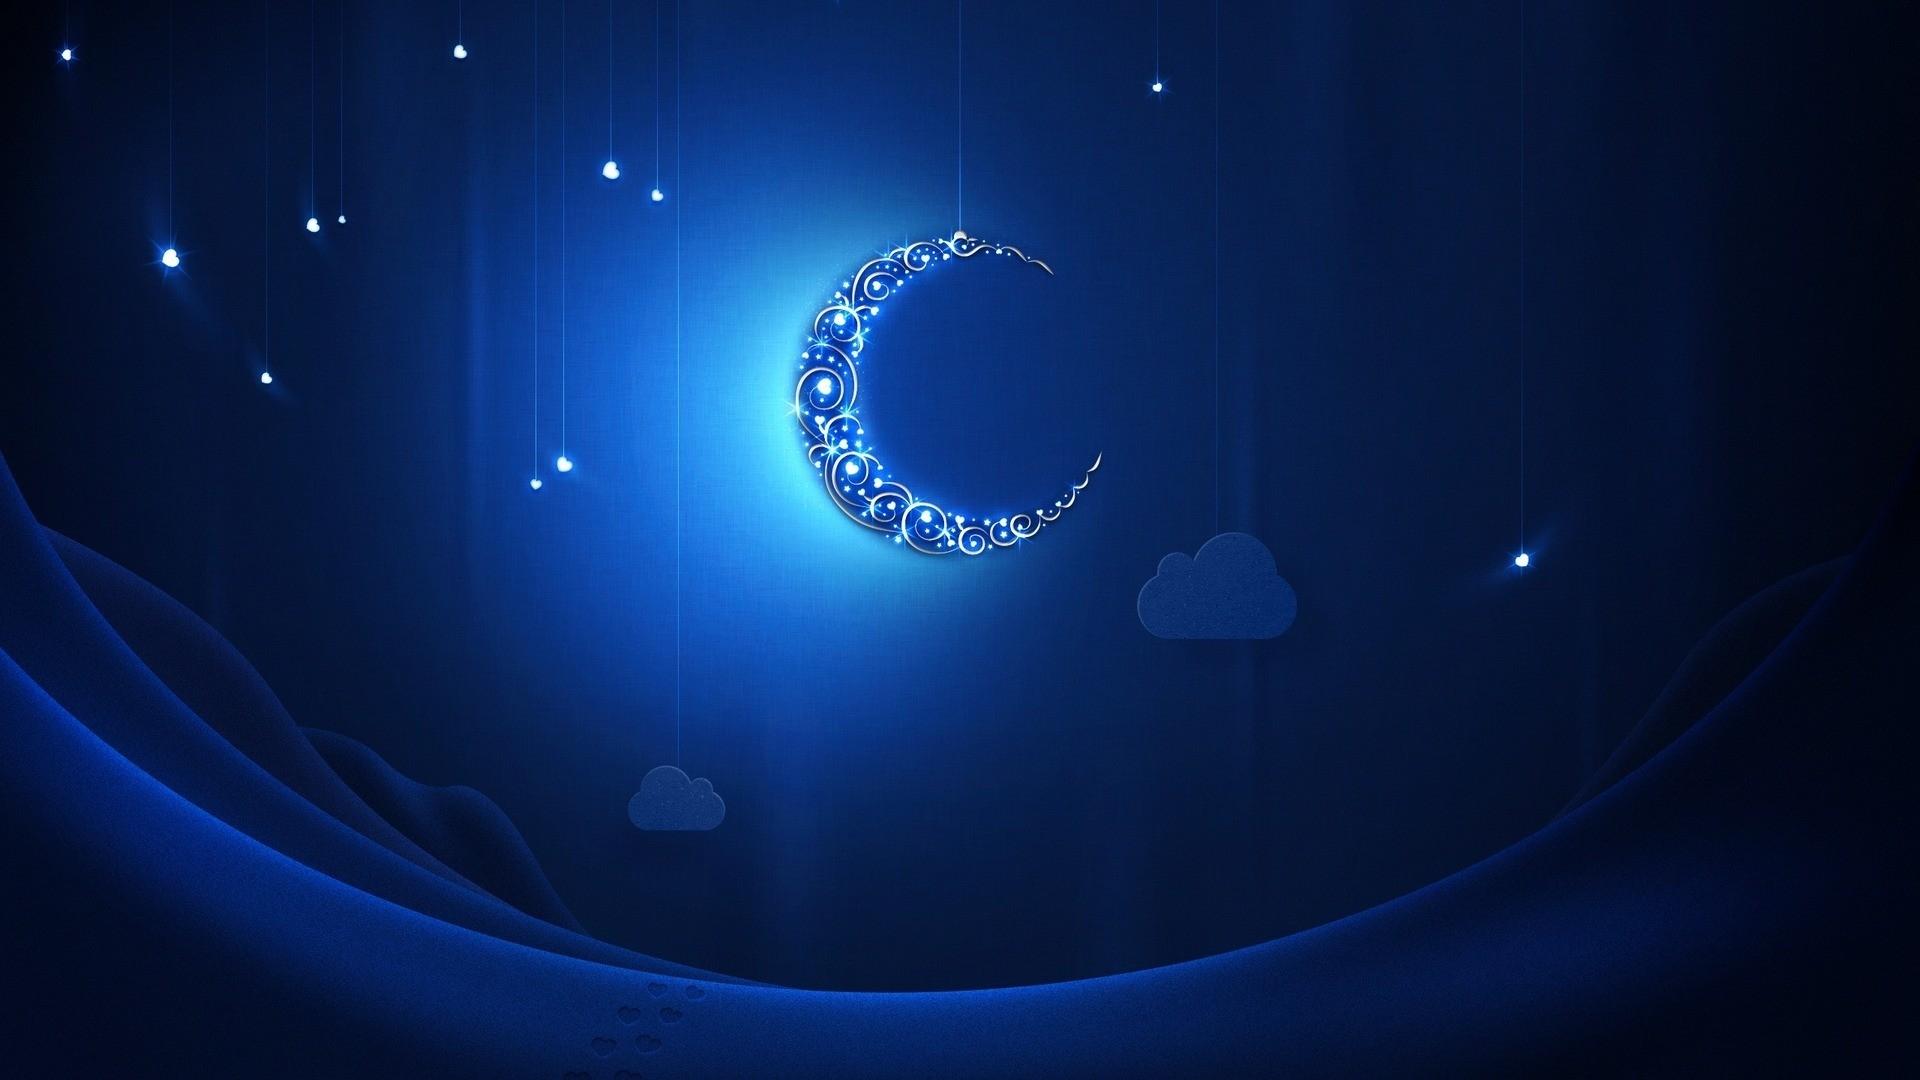 crescent moon light shiny neon